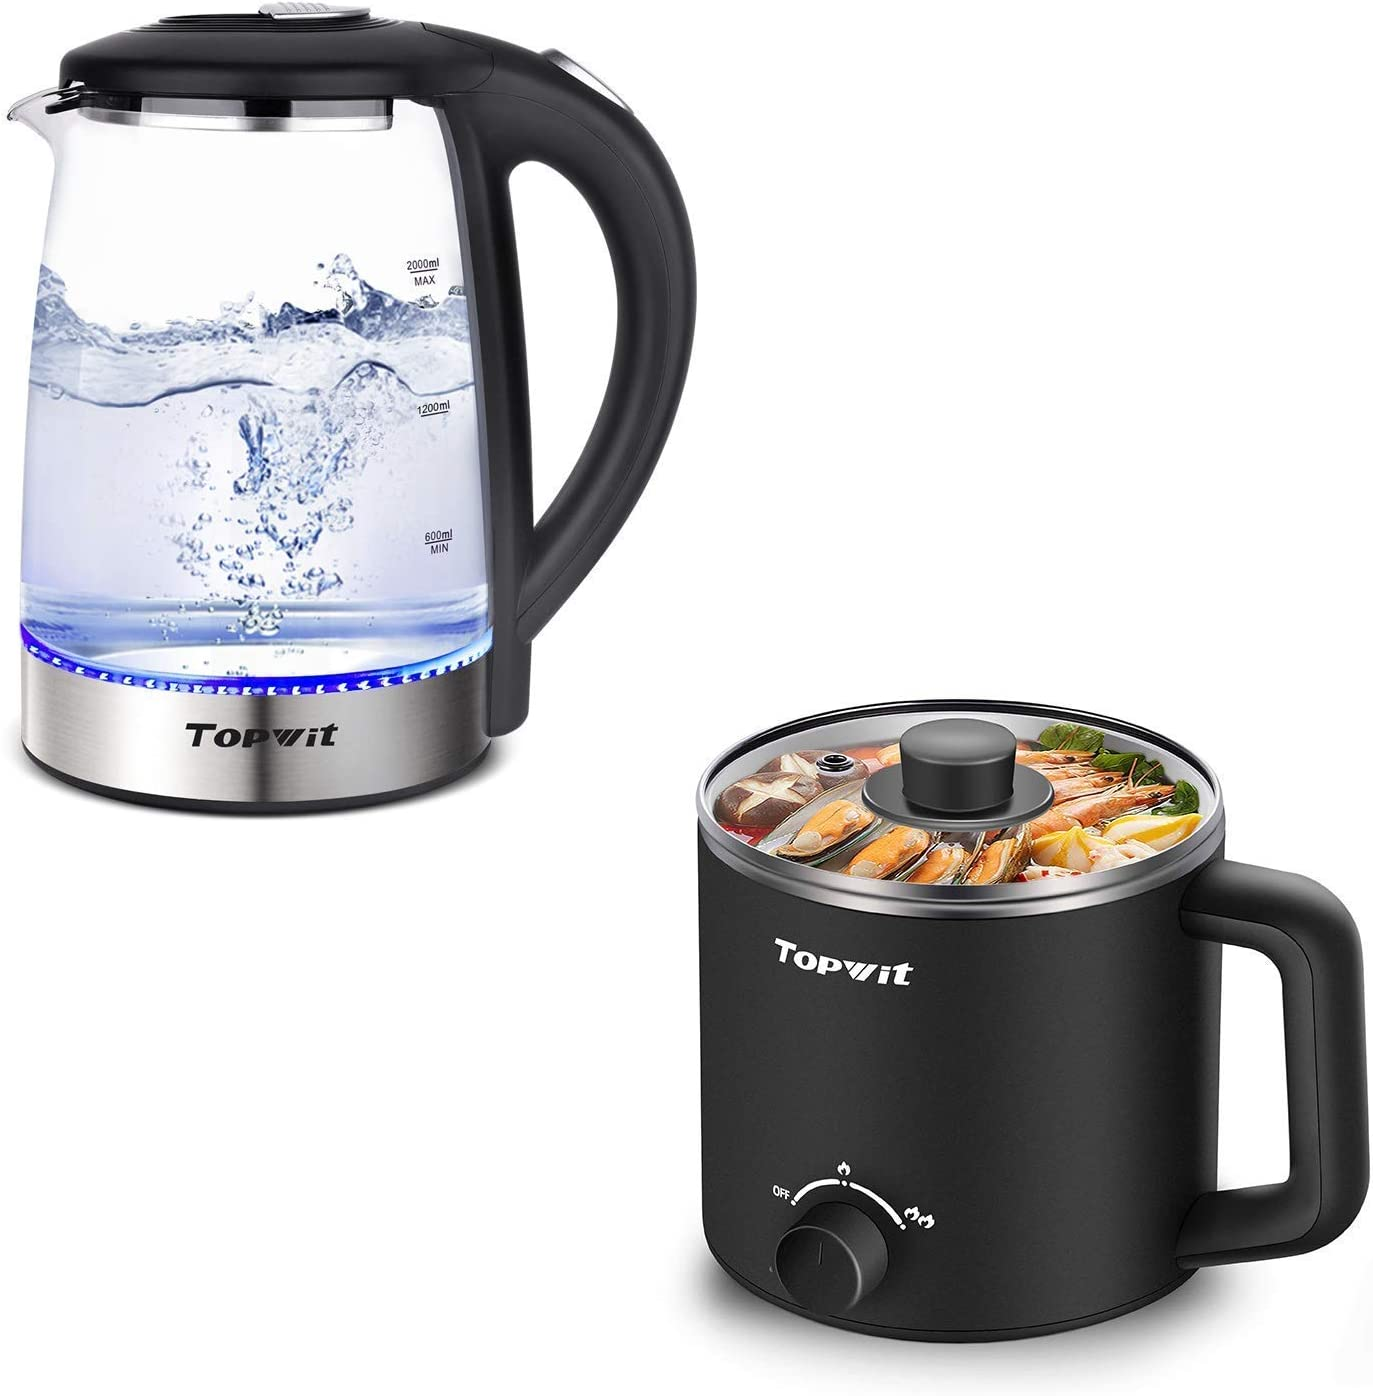 Topwit 2L Electric Kettle Glass with Auto Shut-Off & Boil Dry Protection and Electric Hot Pot, Mini Ramen Cooker, 1.6L Noodles Pot, Black